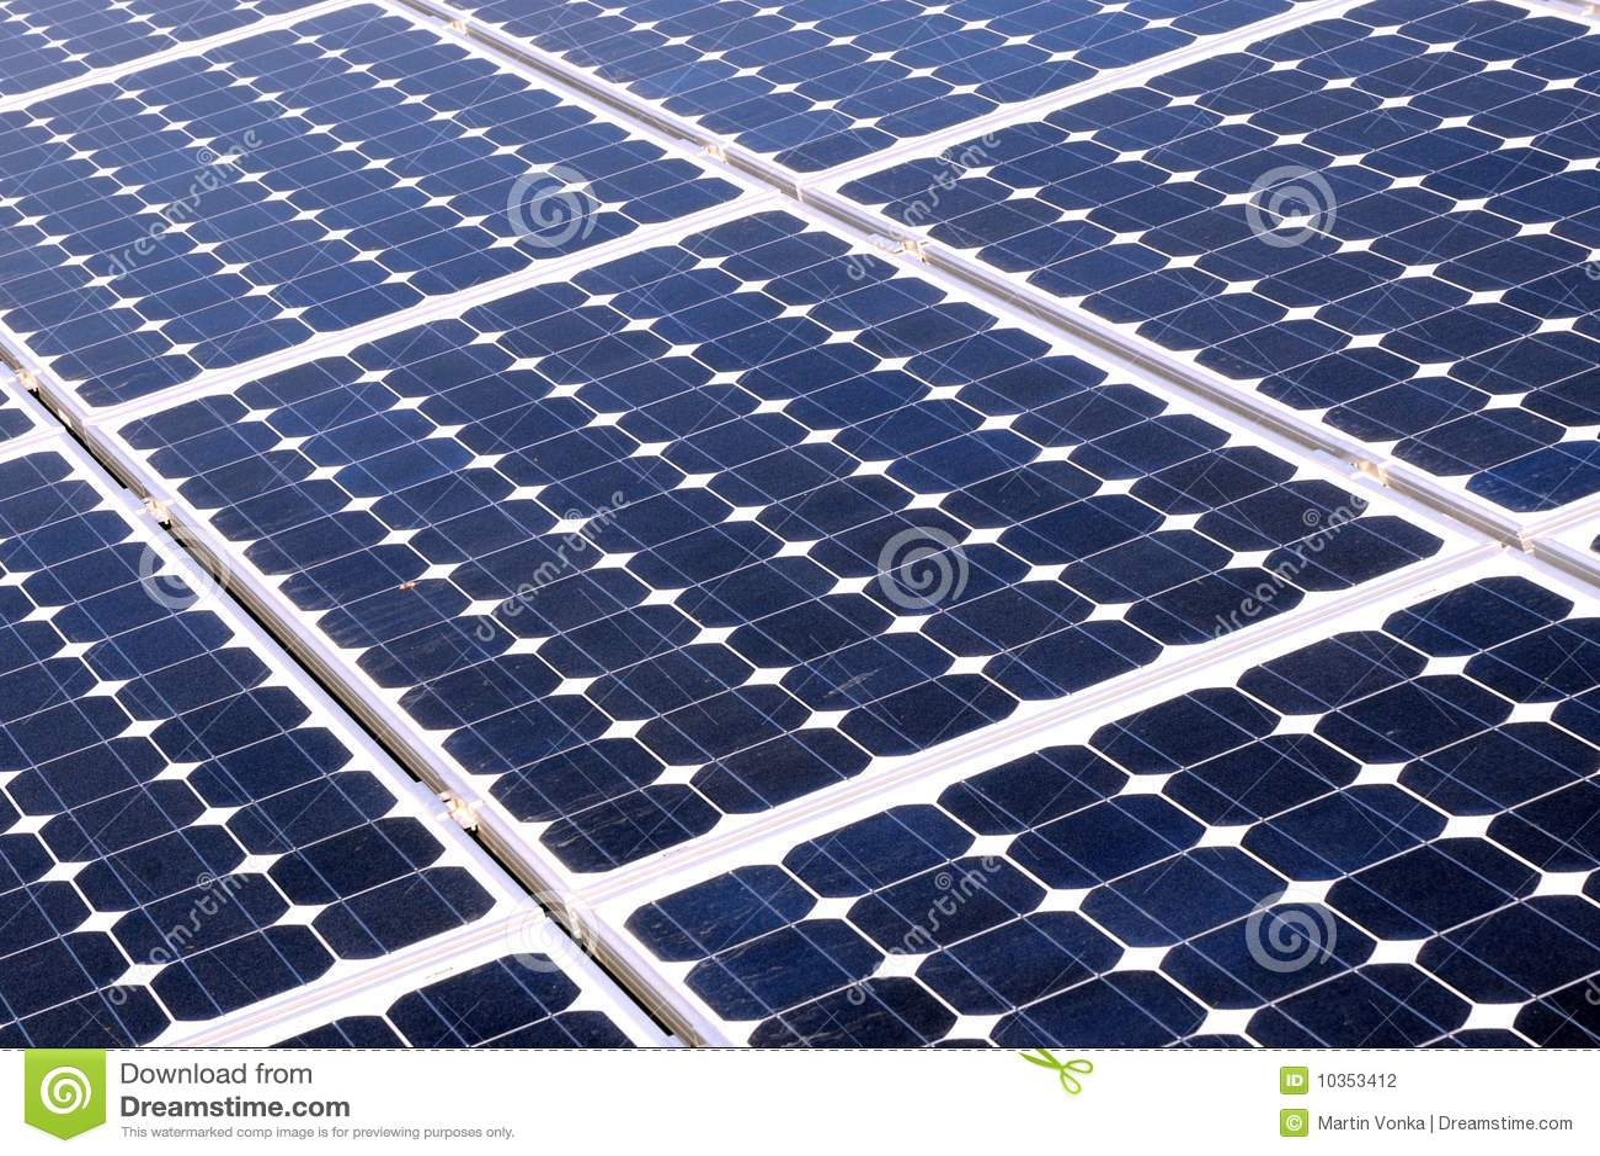 Photovoltaic+Solar+Cells Photovoltaic Cells - Solar Energy Stock ...